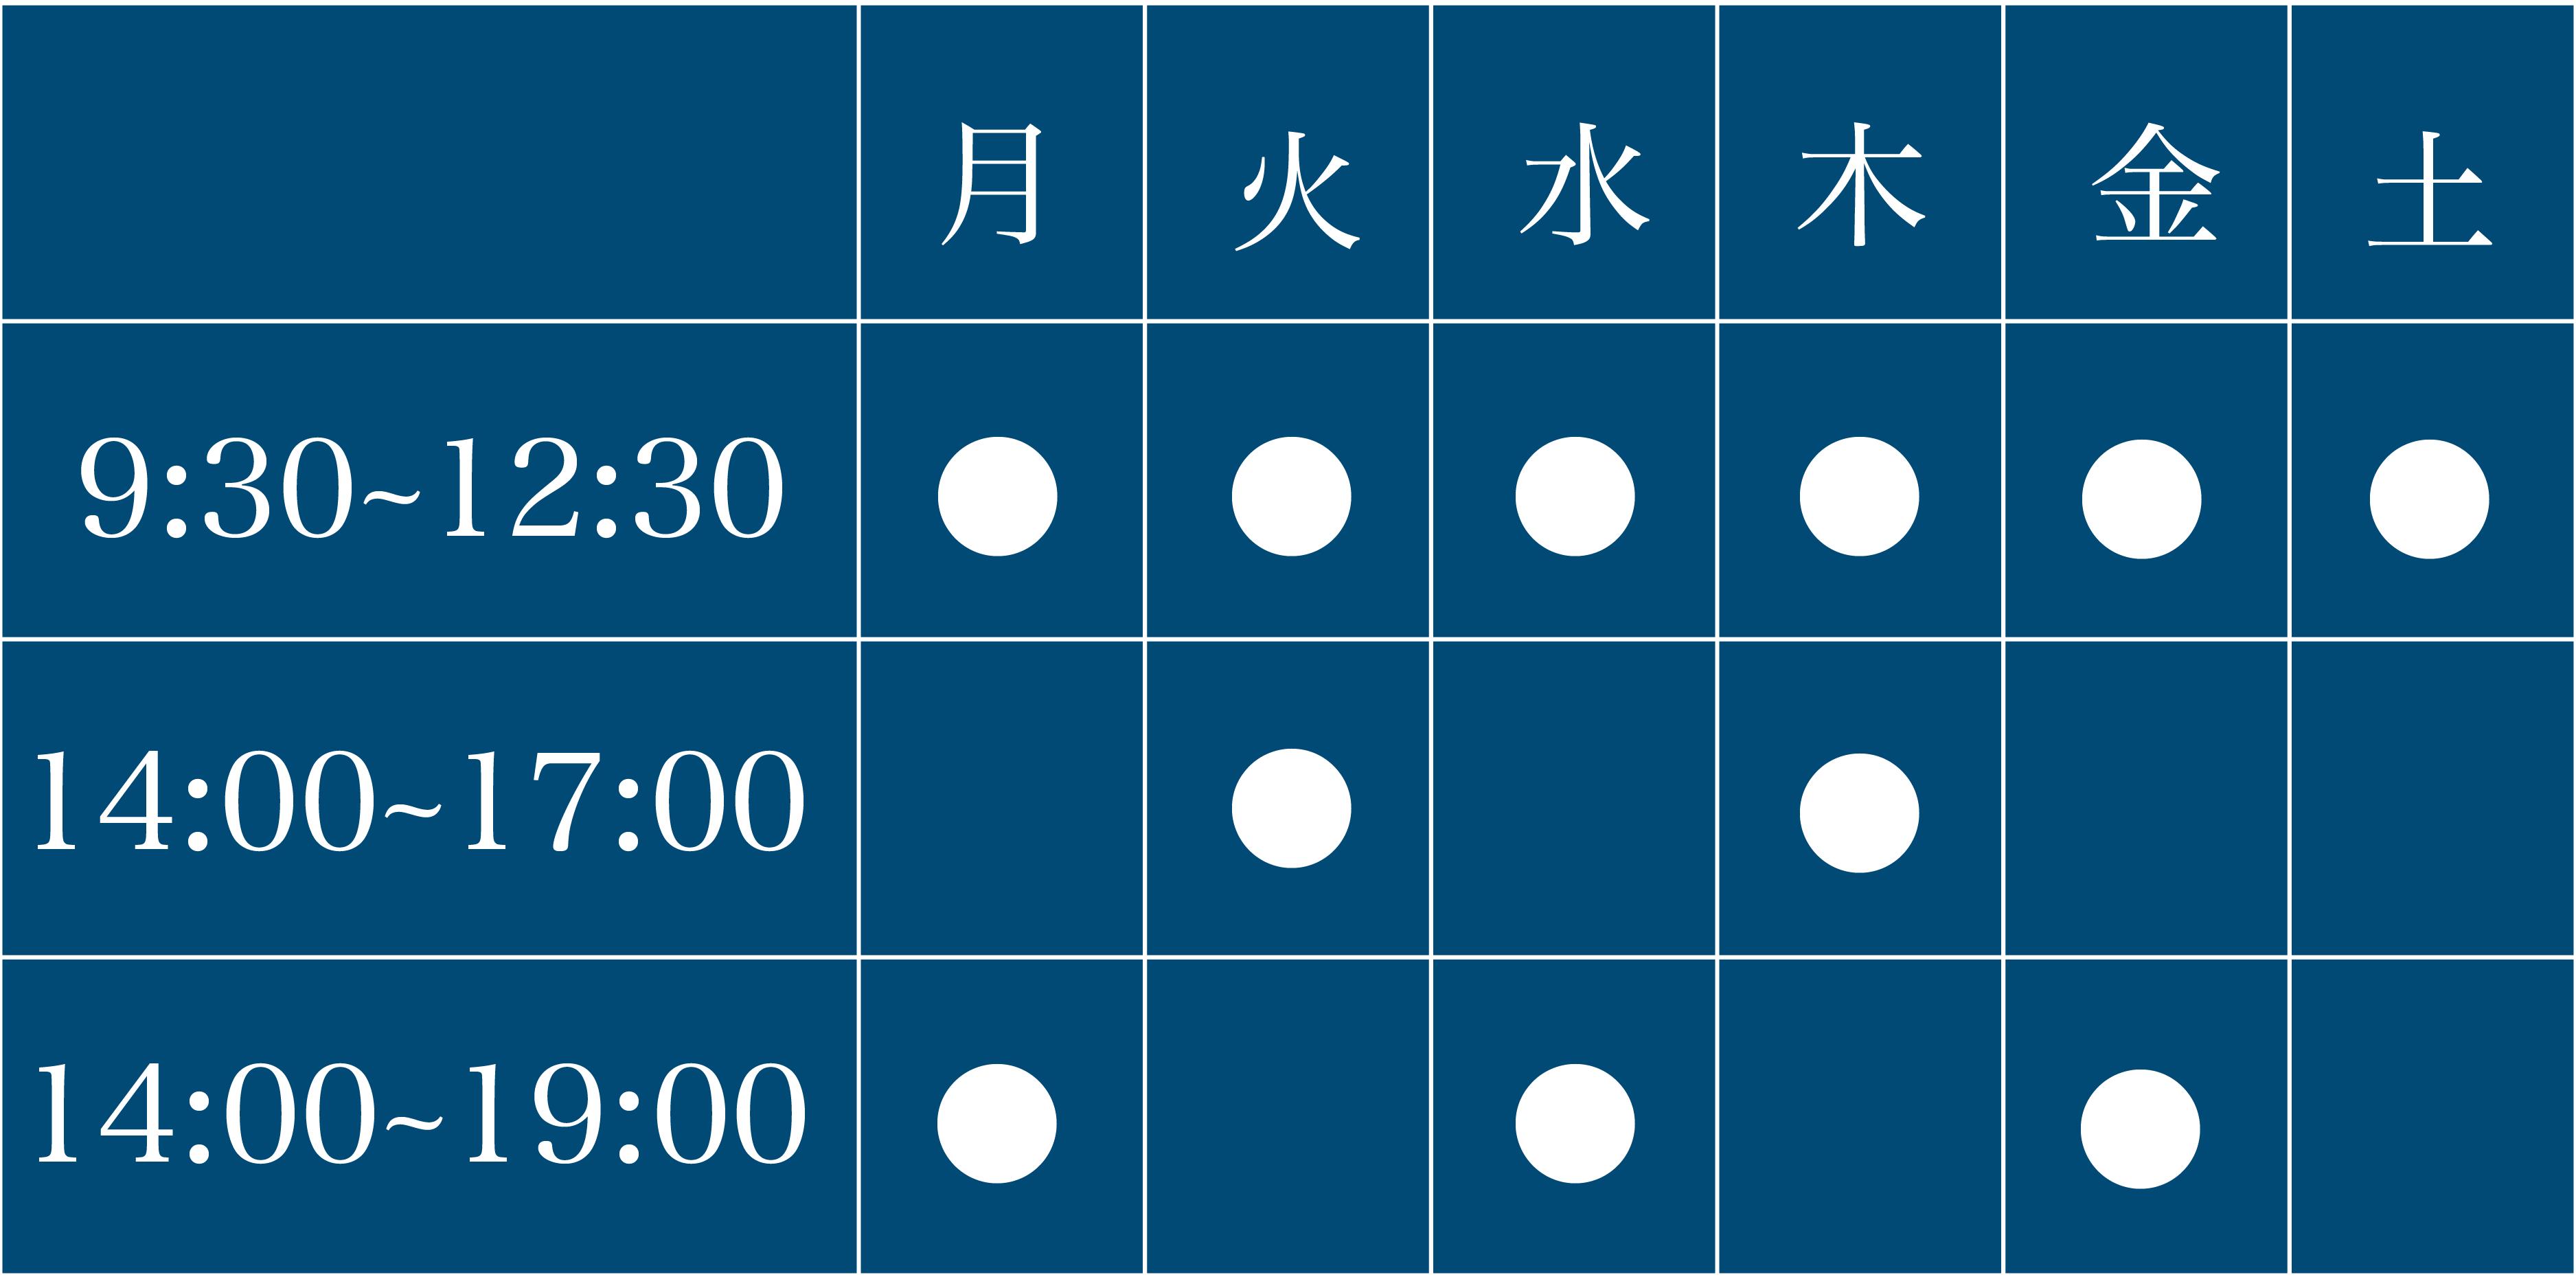 table 02 1 - ブログ